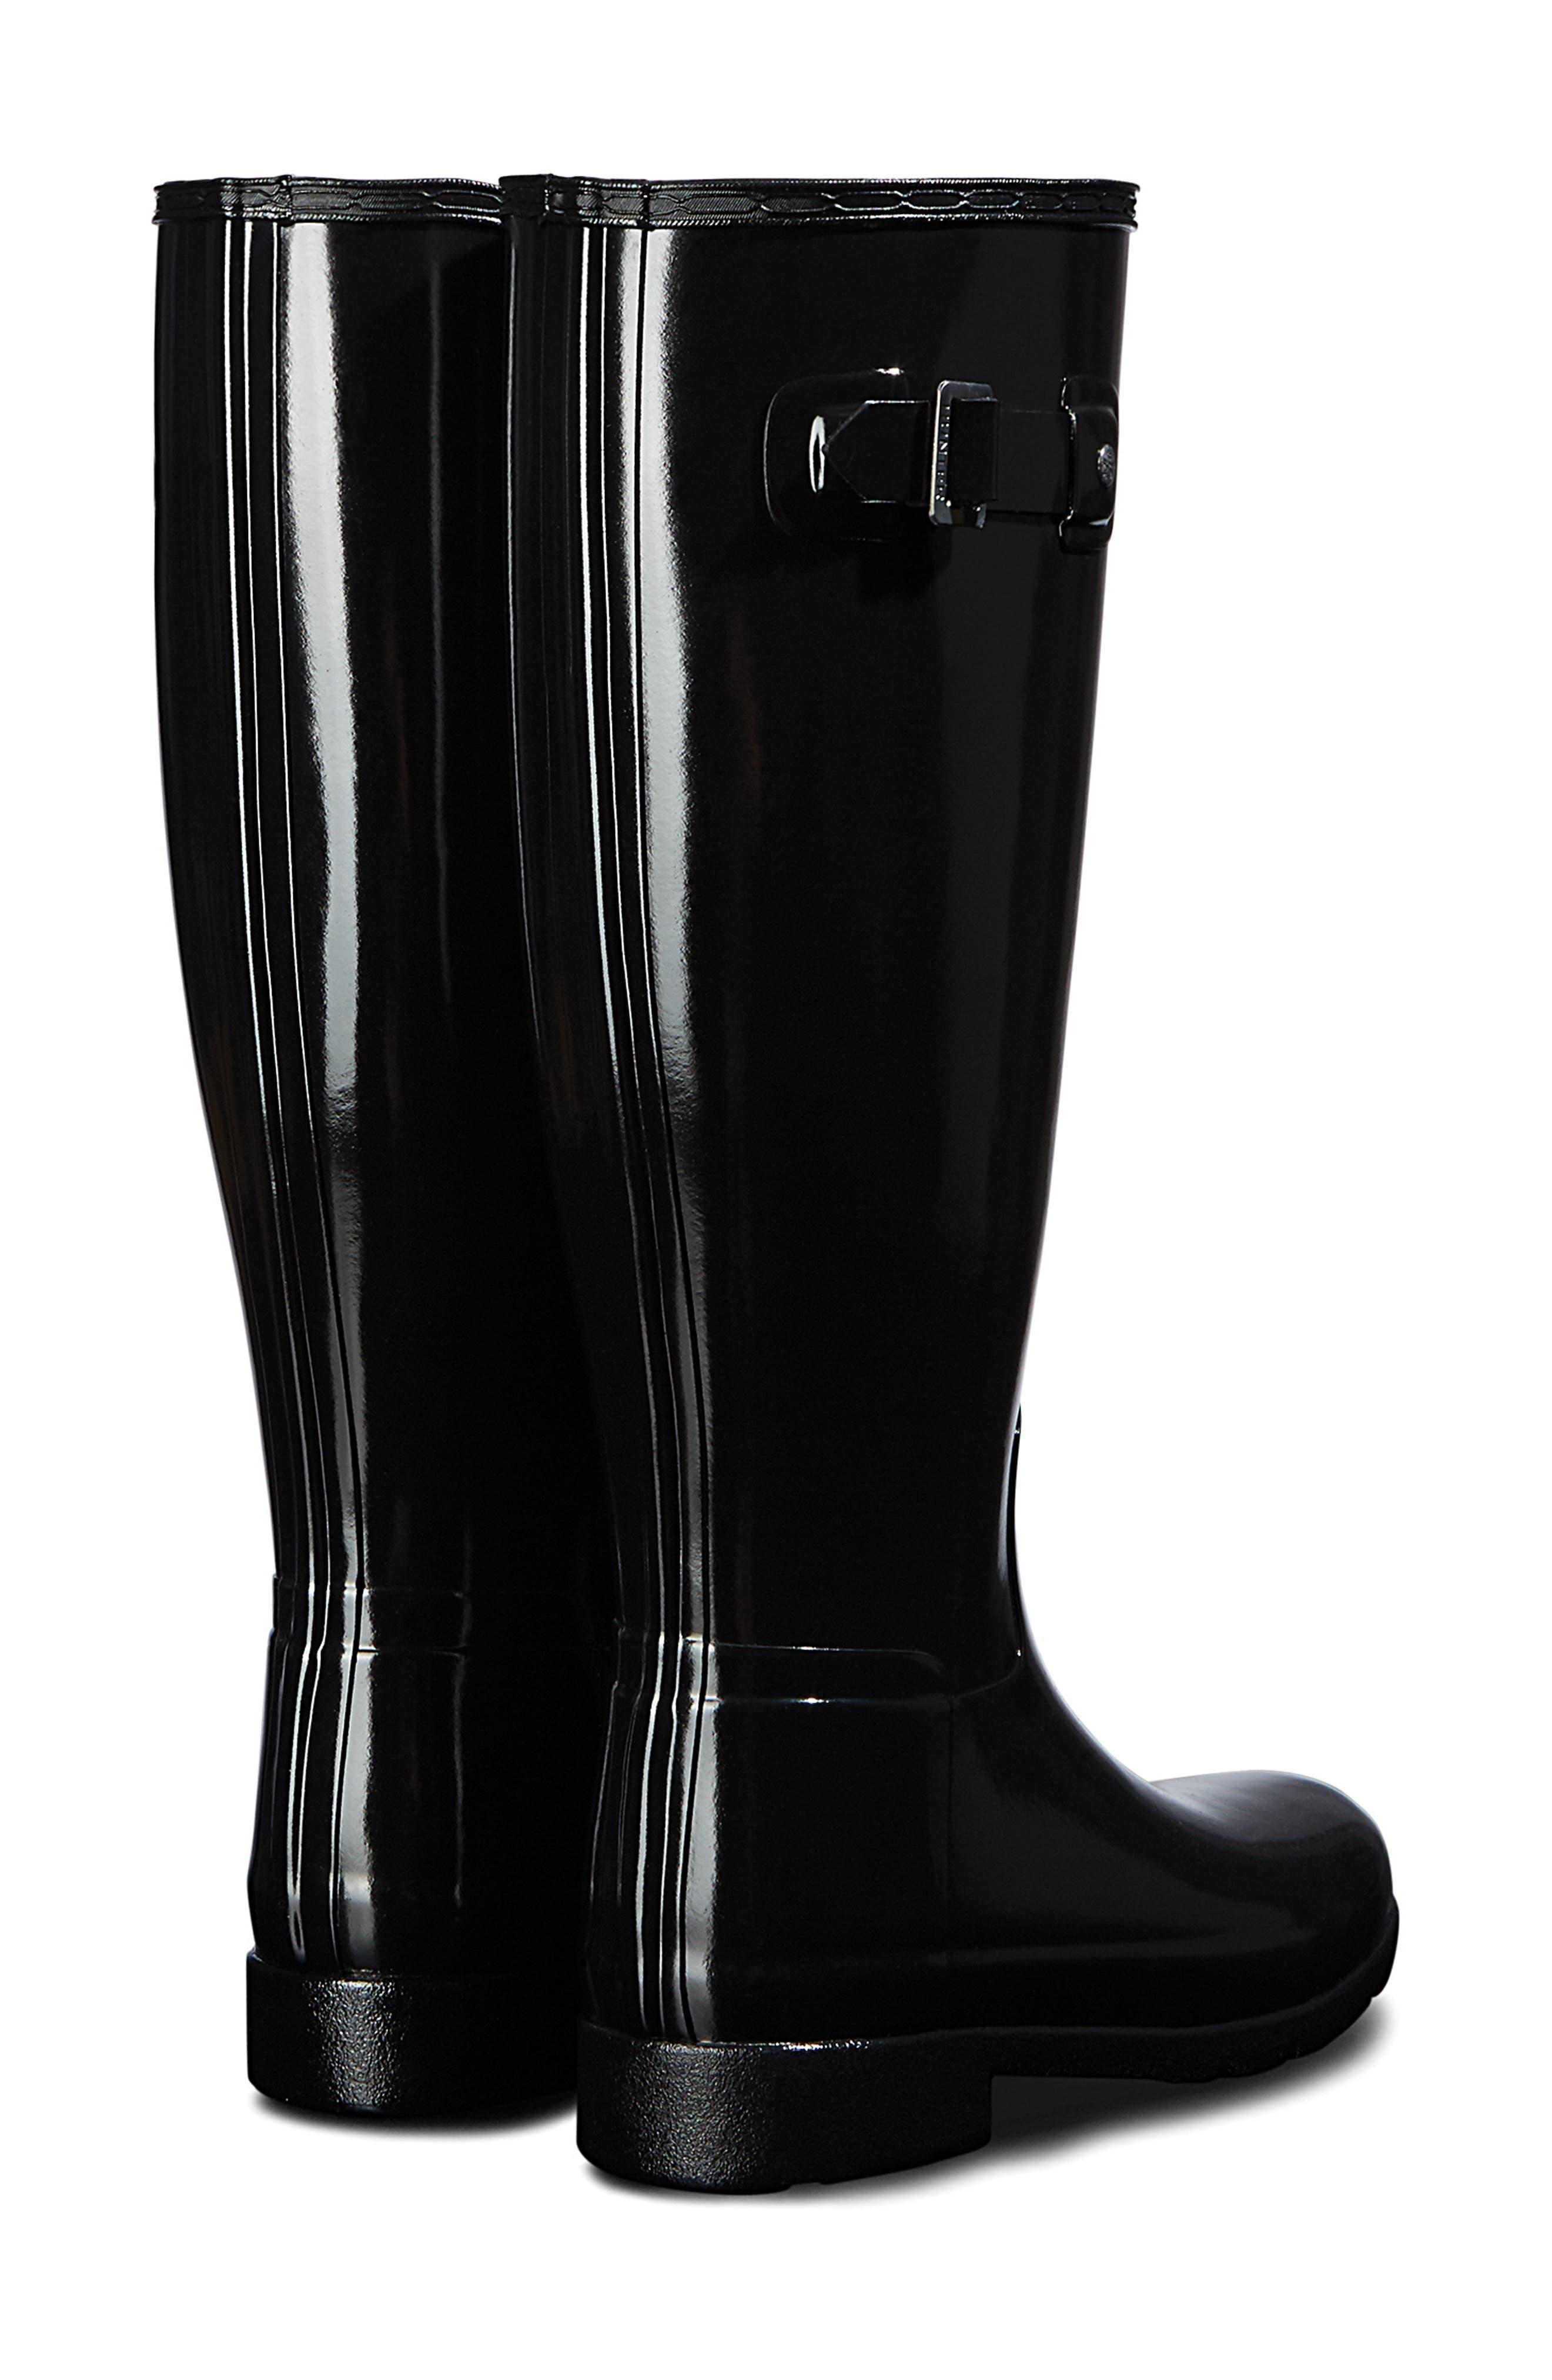 HUNTER, Original Refined Gloss Tall Waterproof Rain Boot, Alternate thumbnail 2, color, BLACK